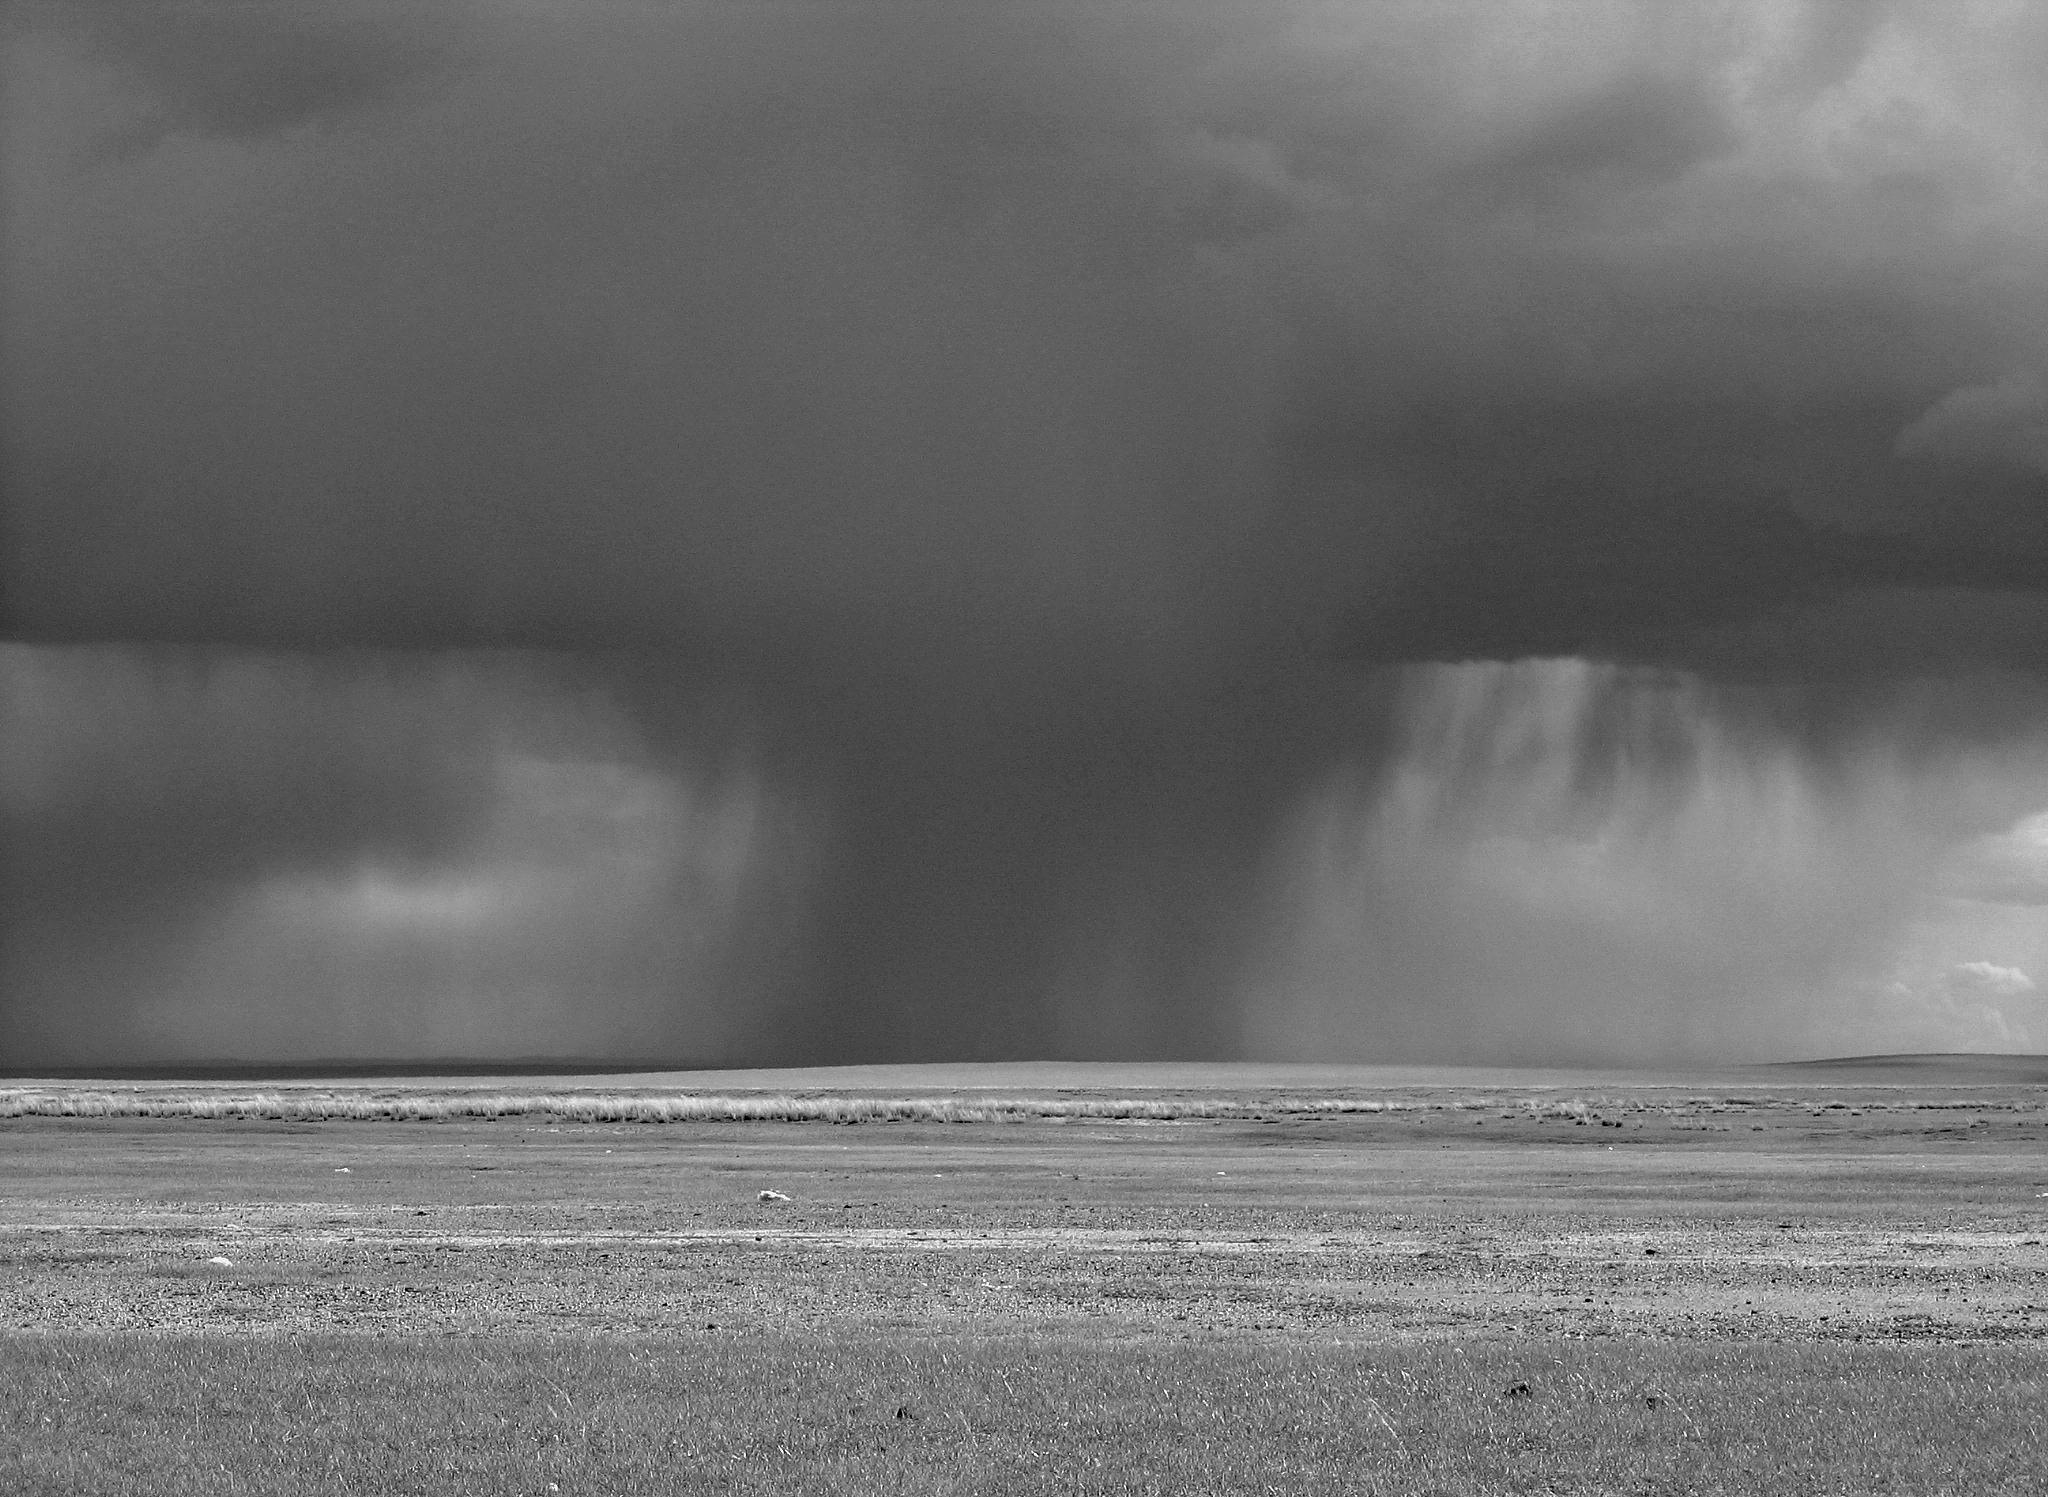 A rainy day on the prairie part of Gobi desert by KittySchulz